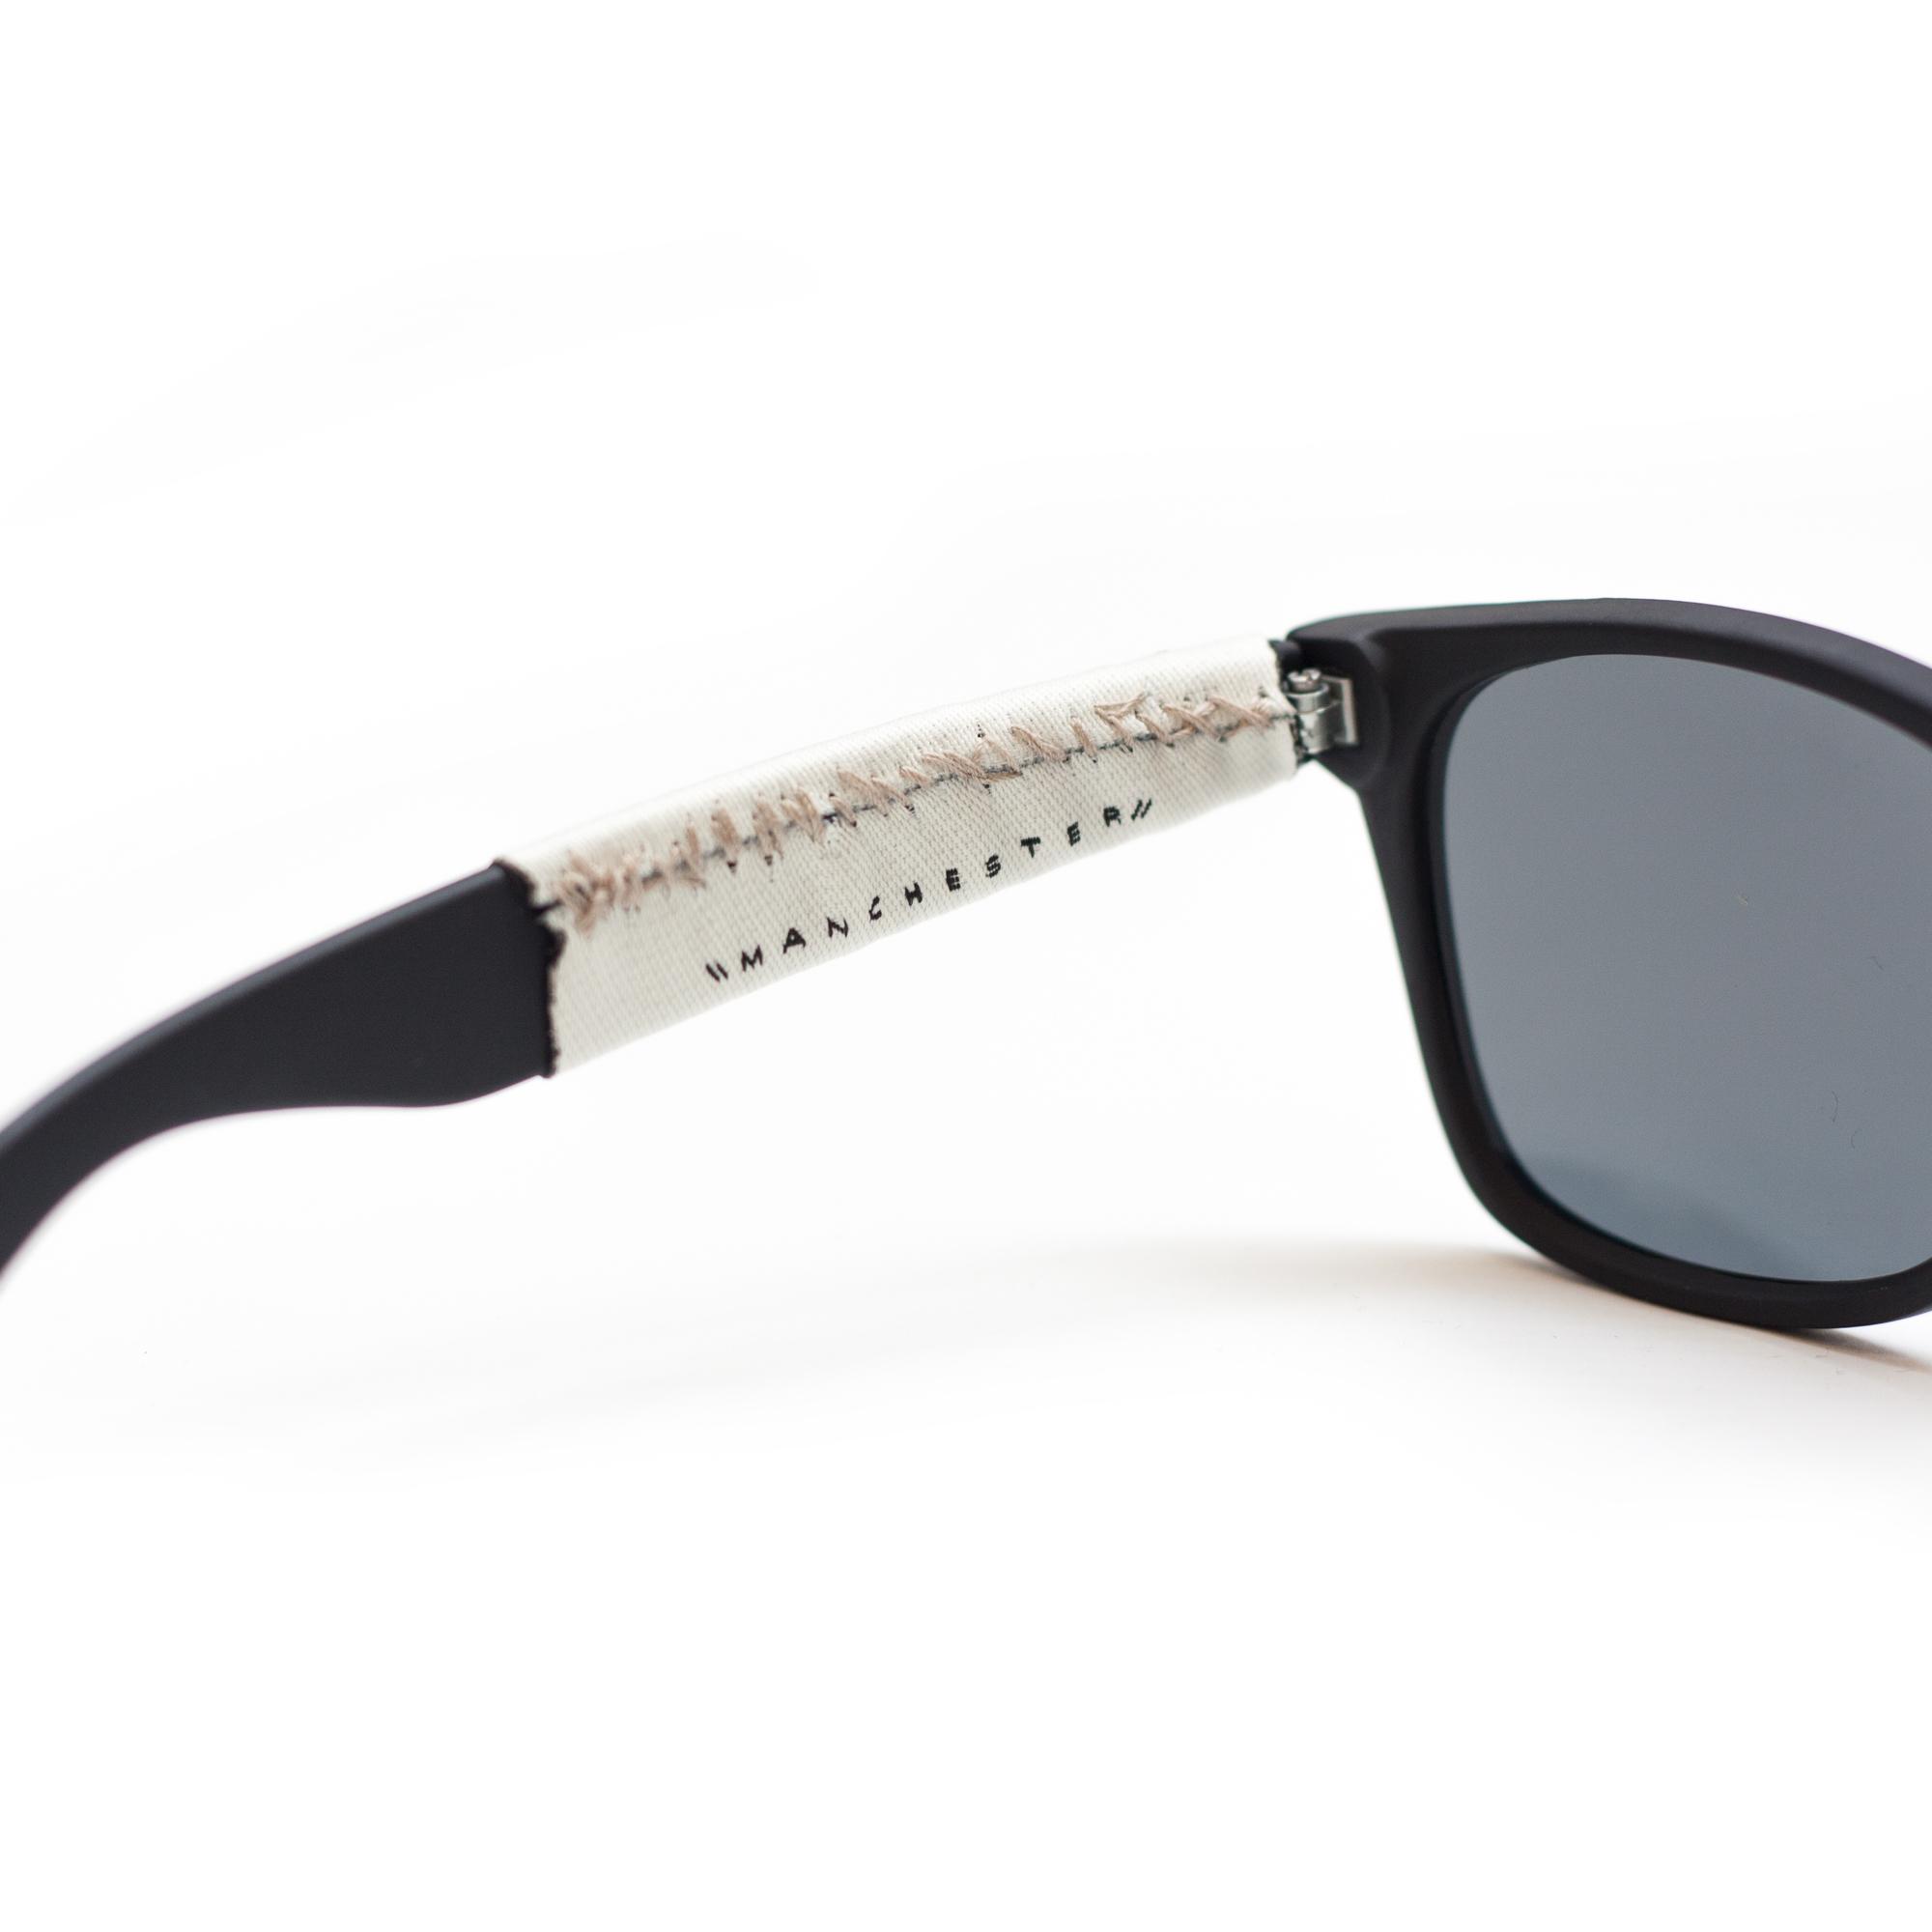 One Nature Sunglasses - 7